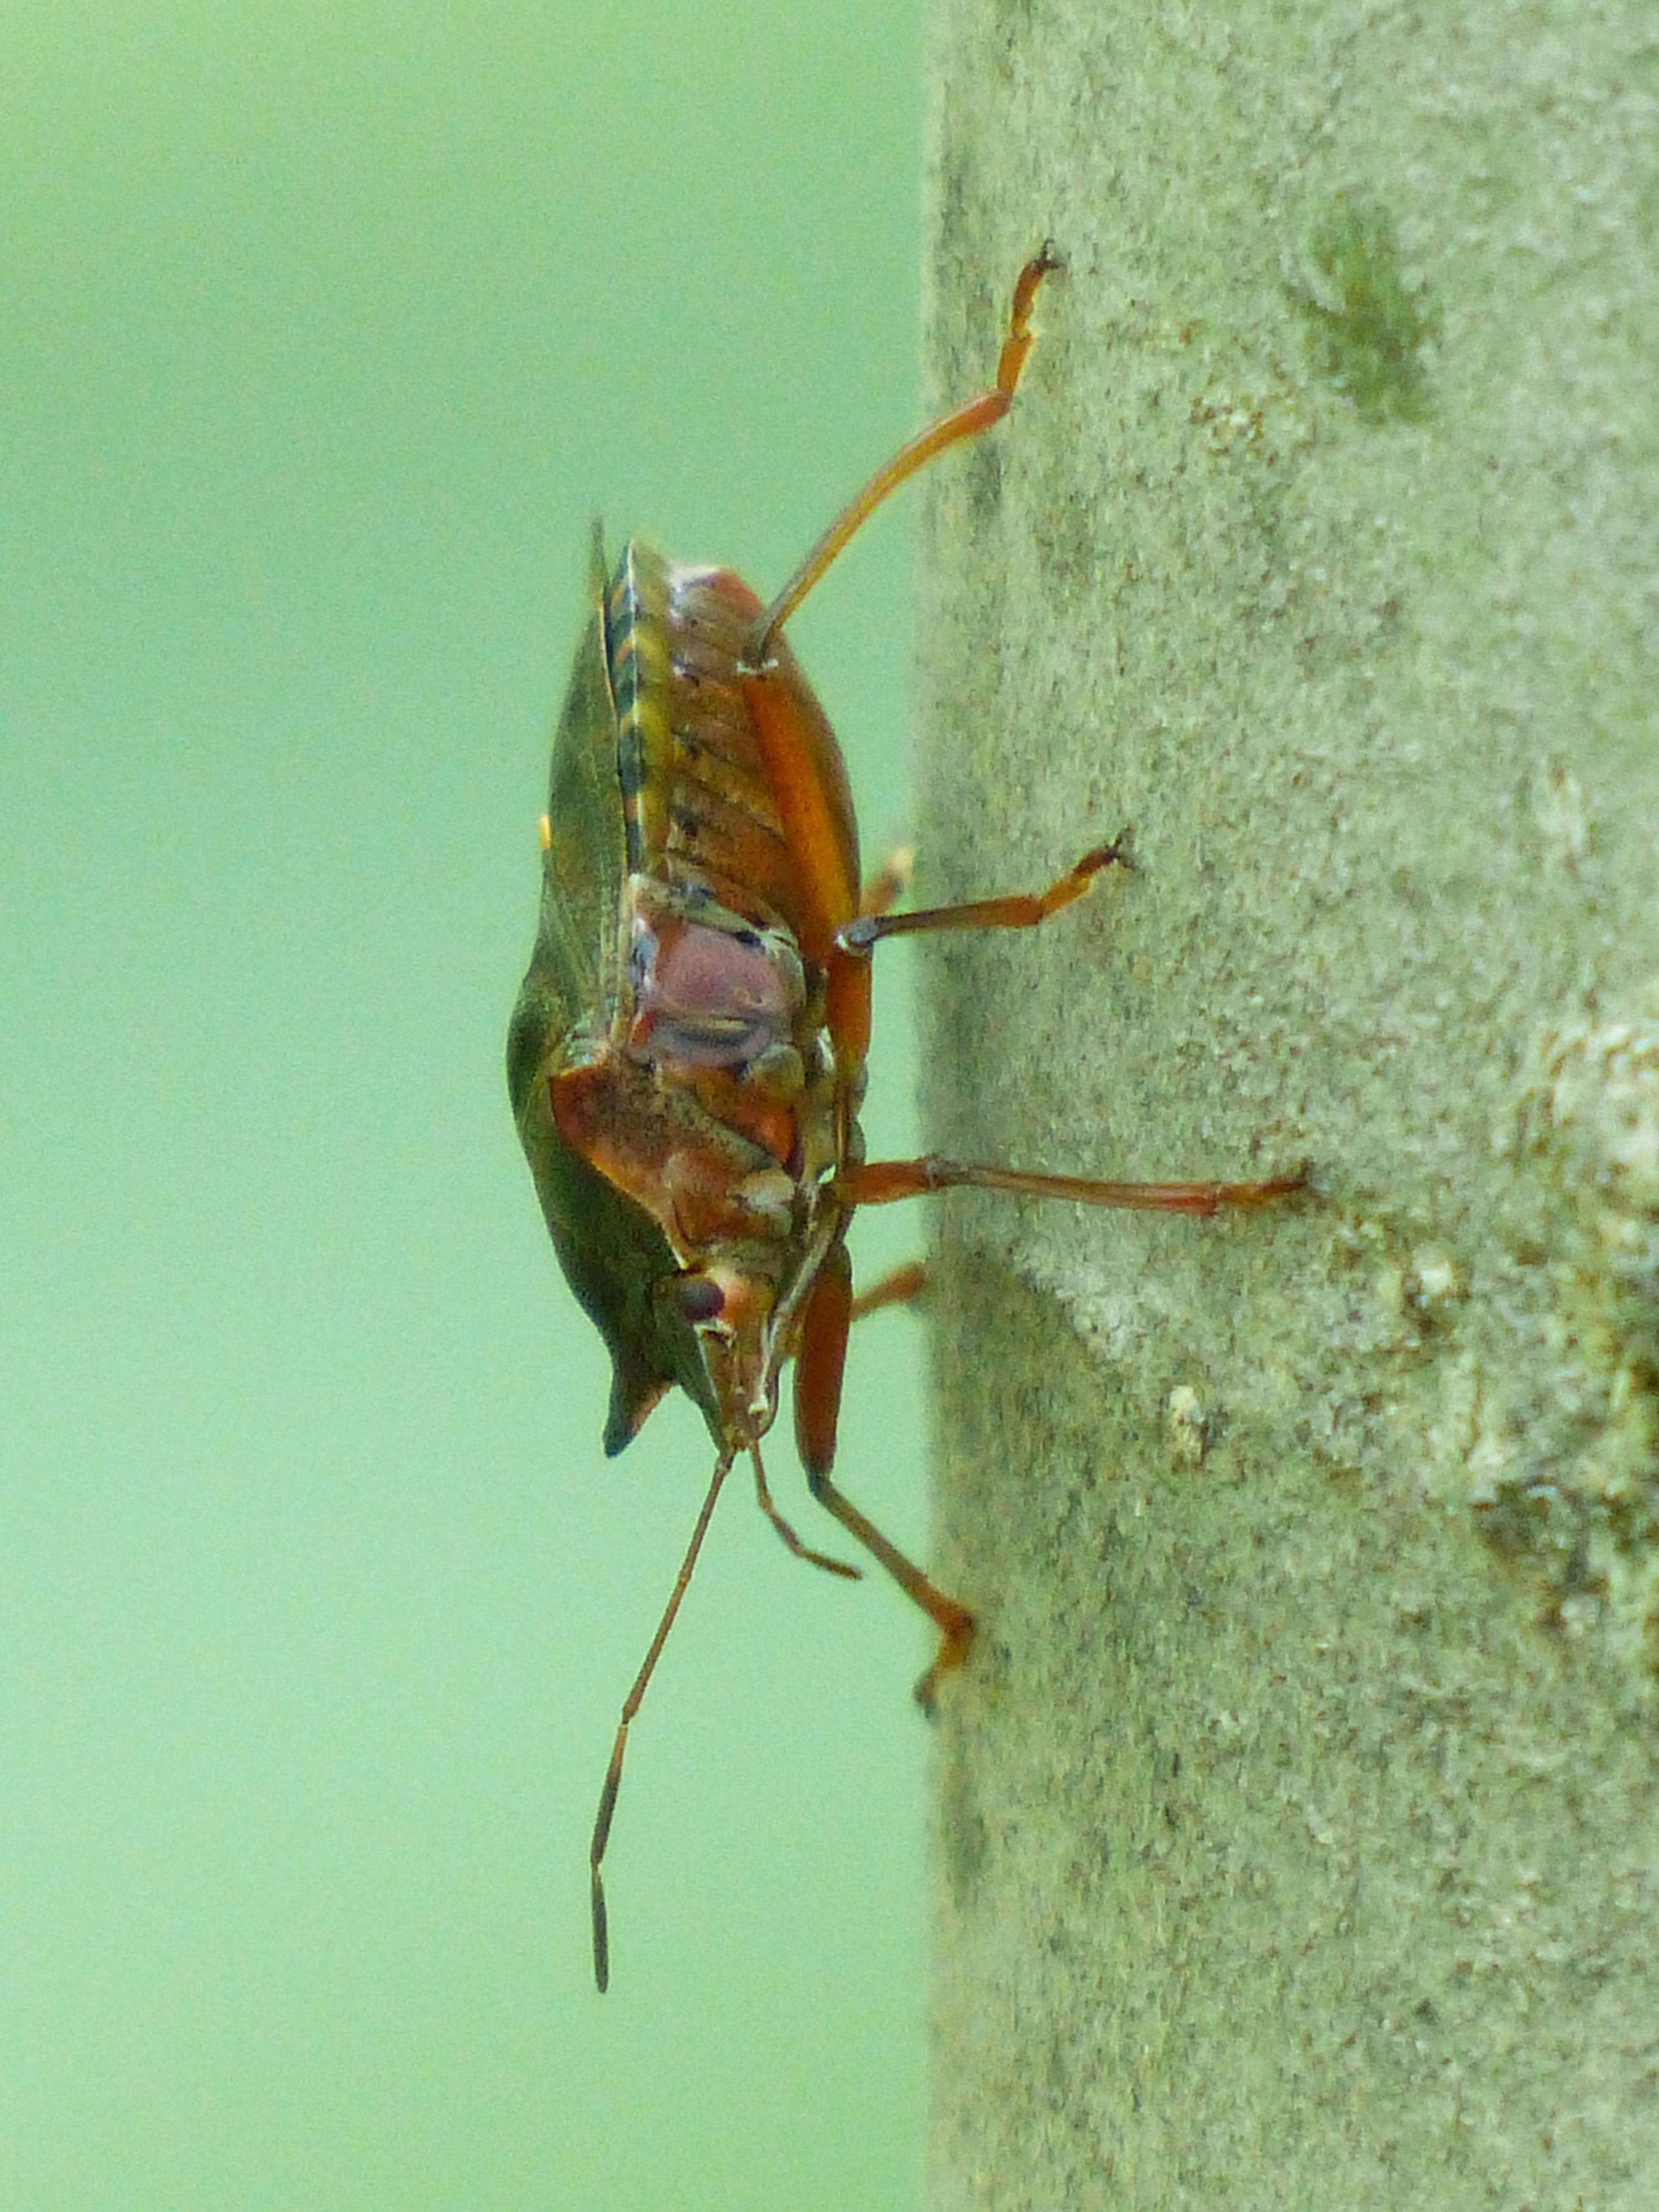 animal insect bug parasite invertebrate pest pentatomidae weevil macro  photography organism arthropod membrane winged insect true